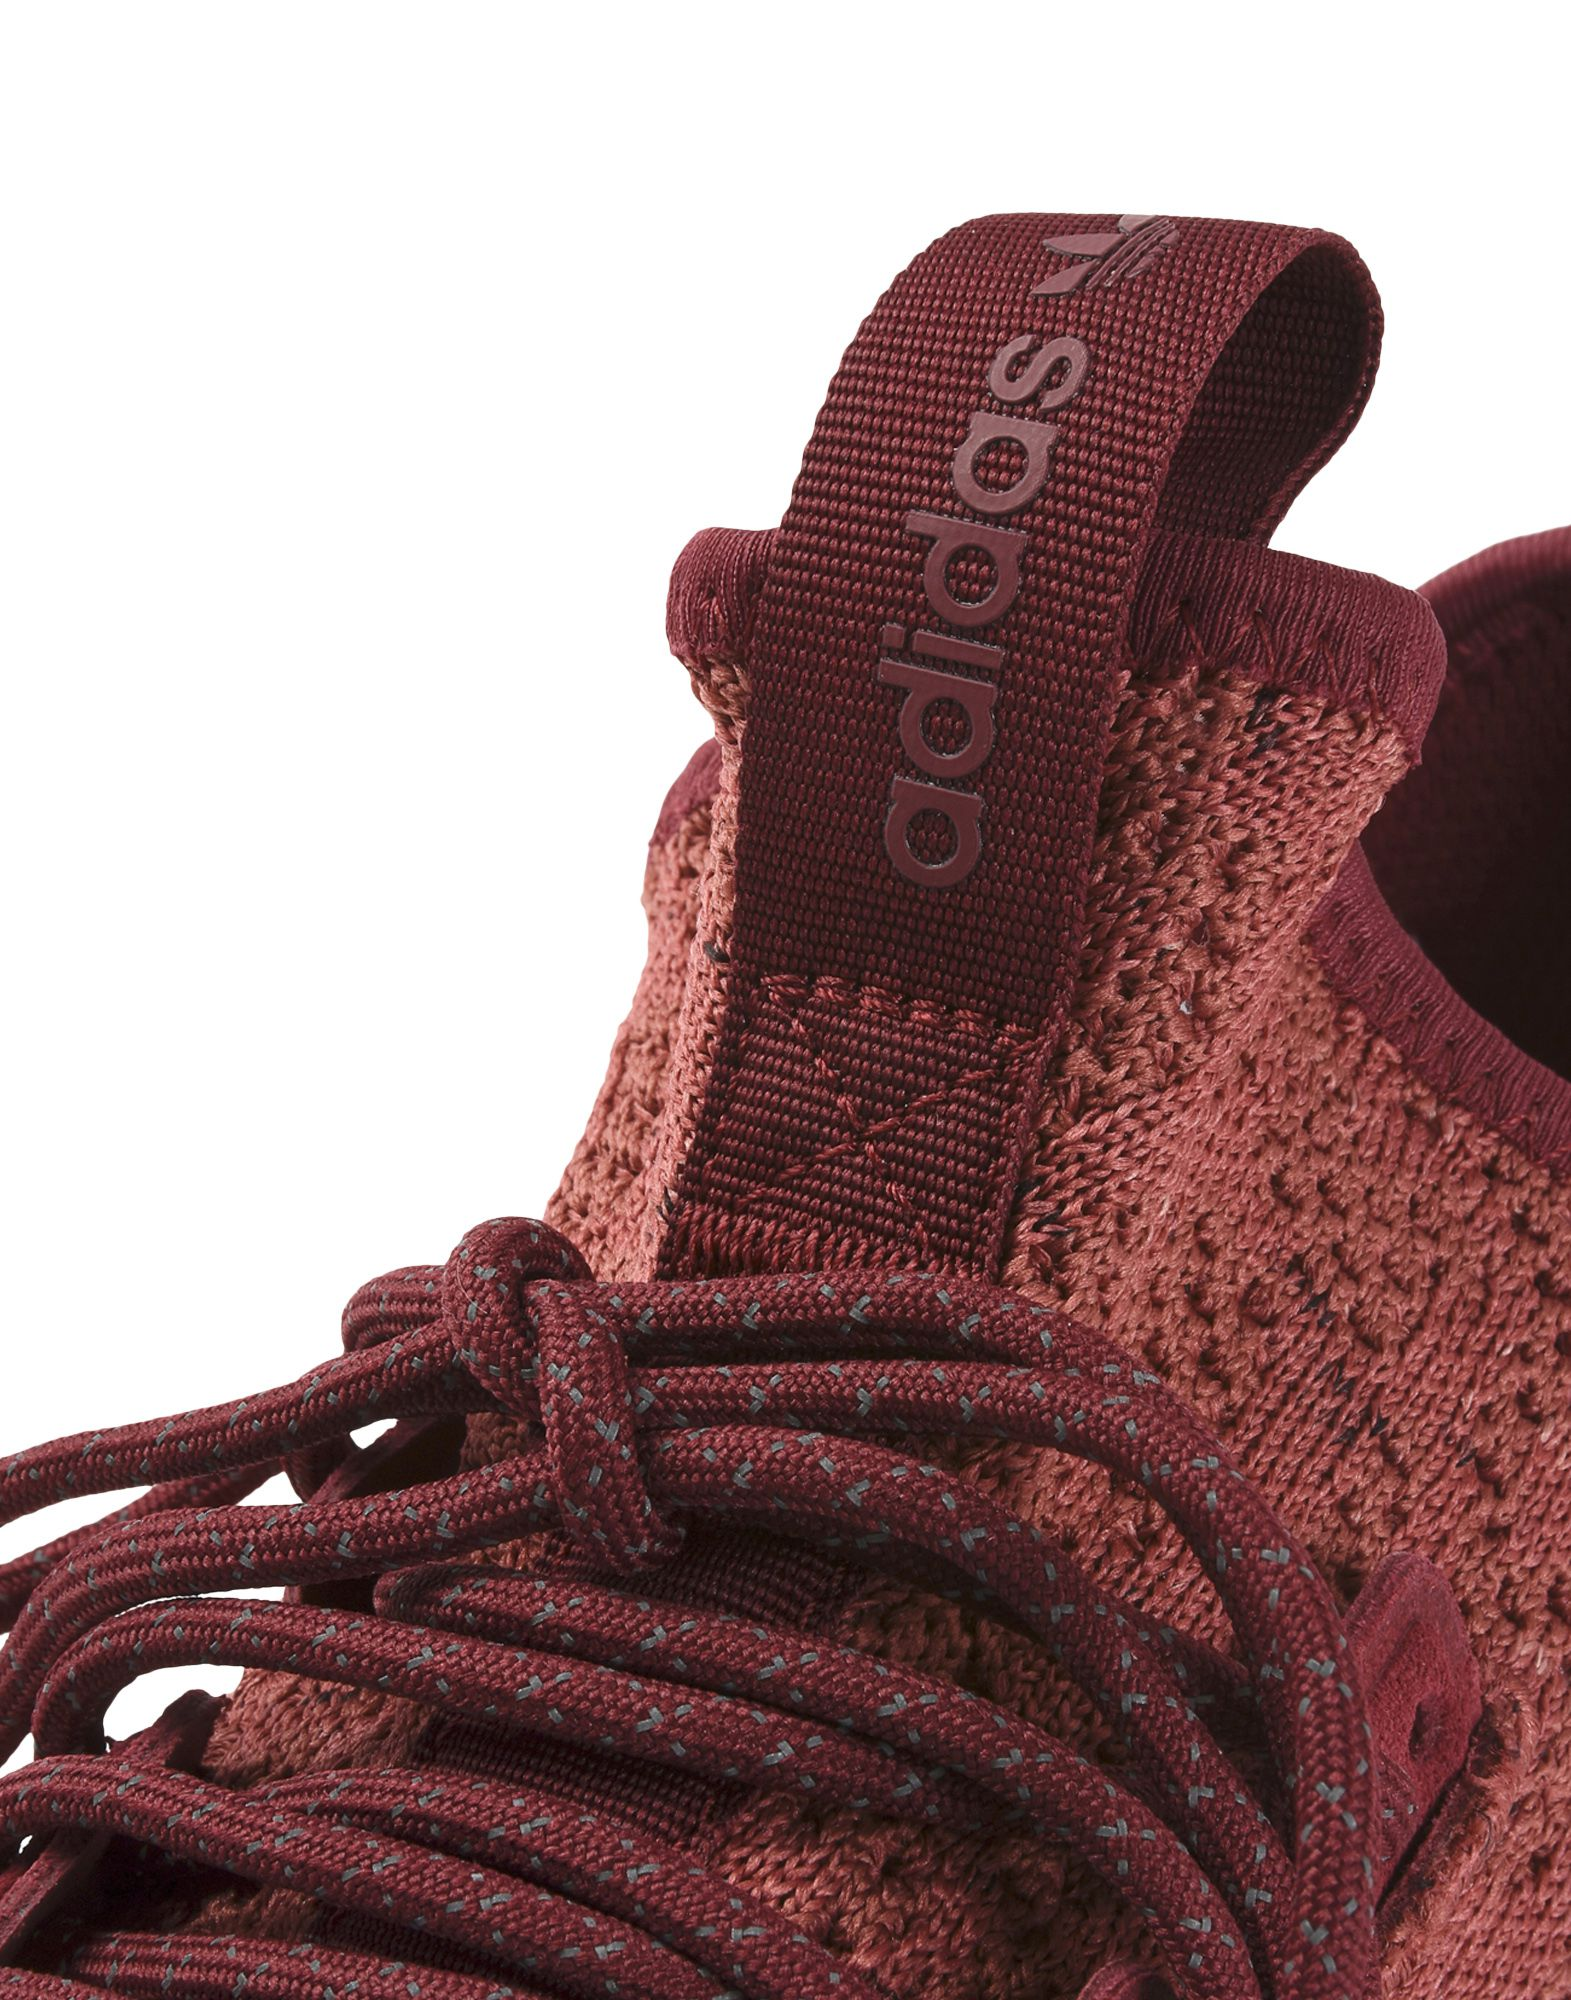 Sneakers Adidas Originals Tubular Doom Sock Pk - Homme - Sneakers Adidas Originals sur